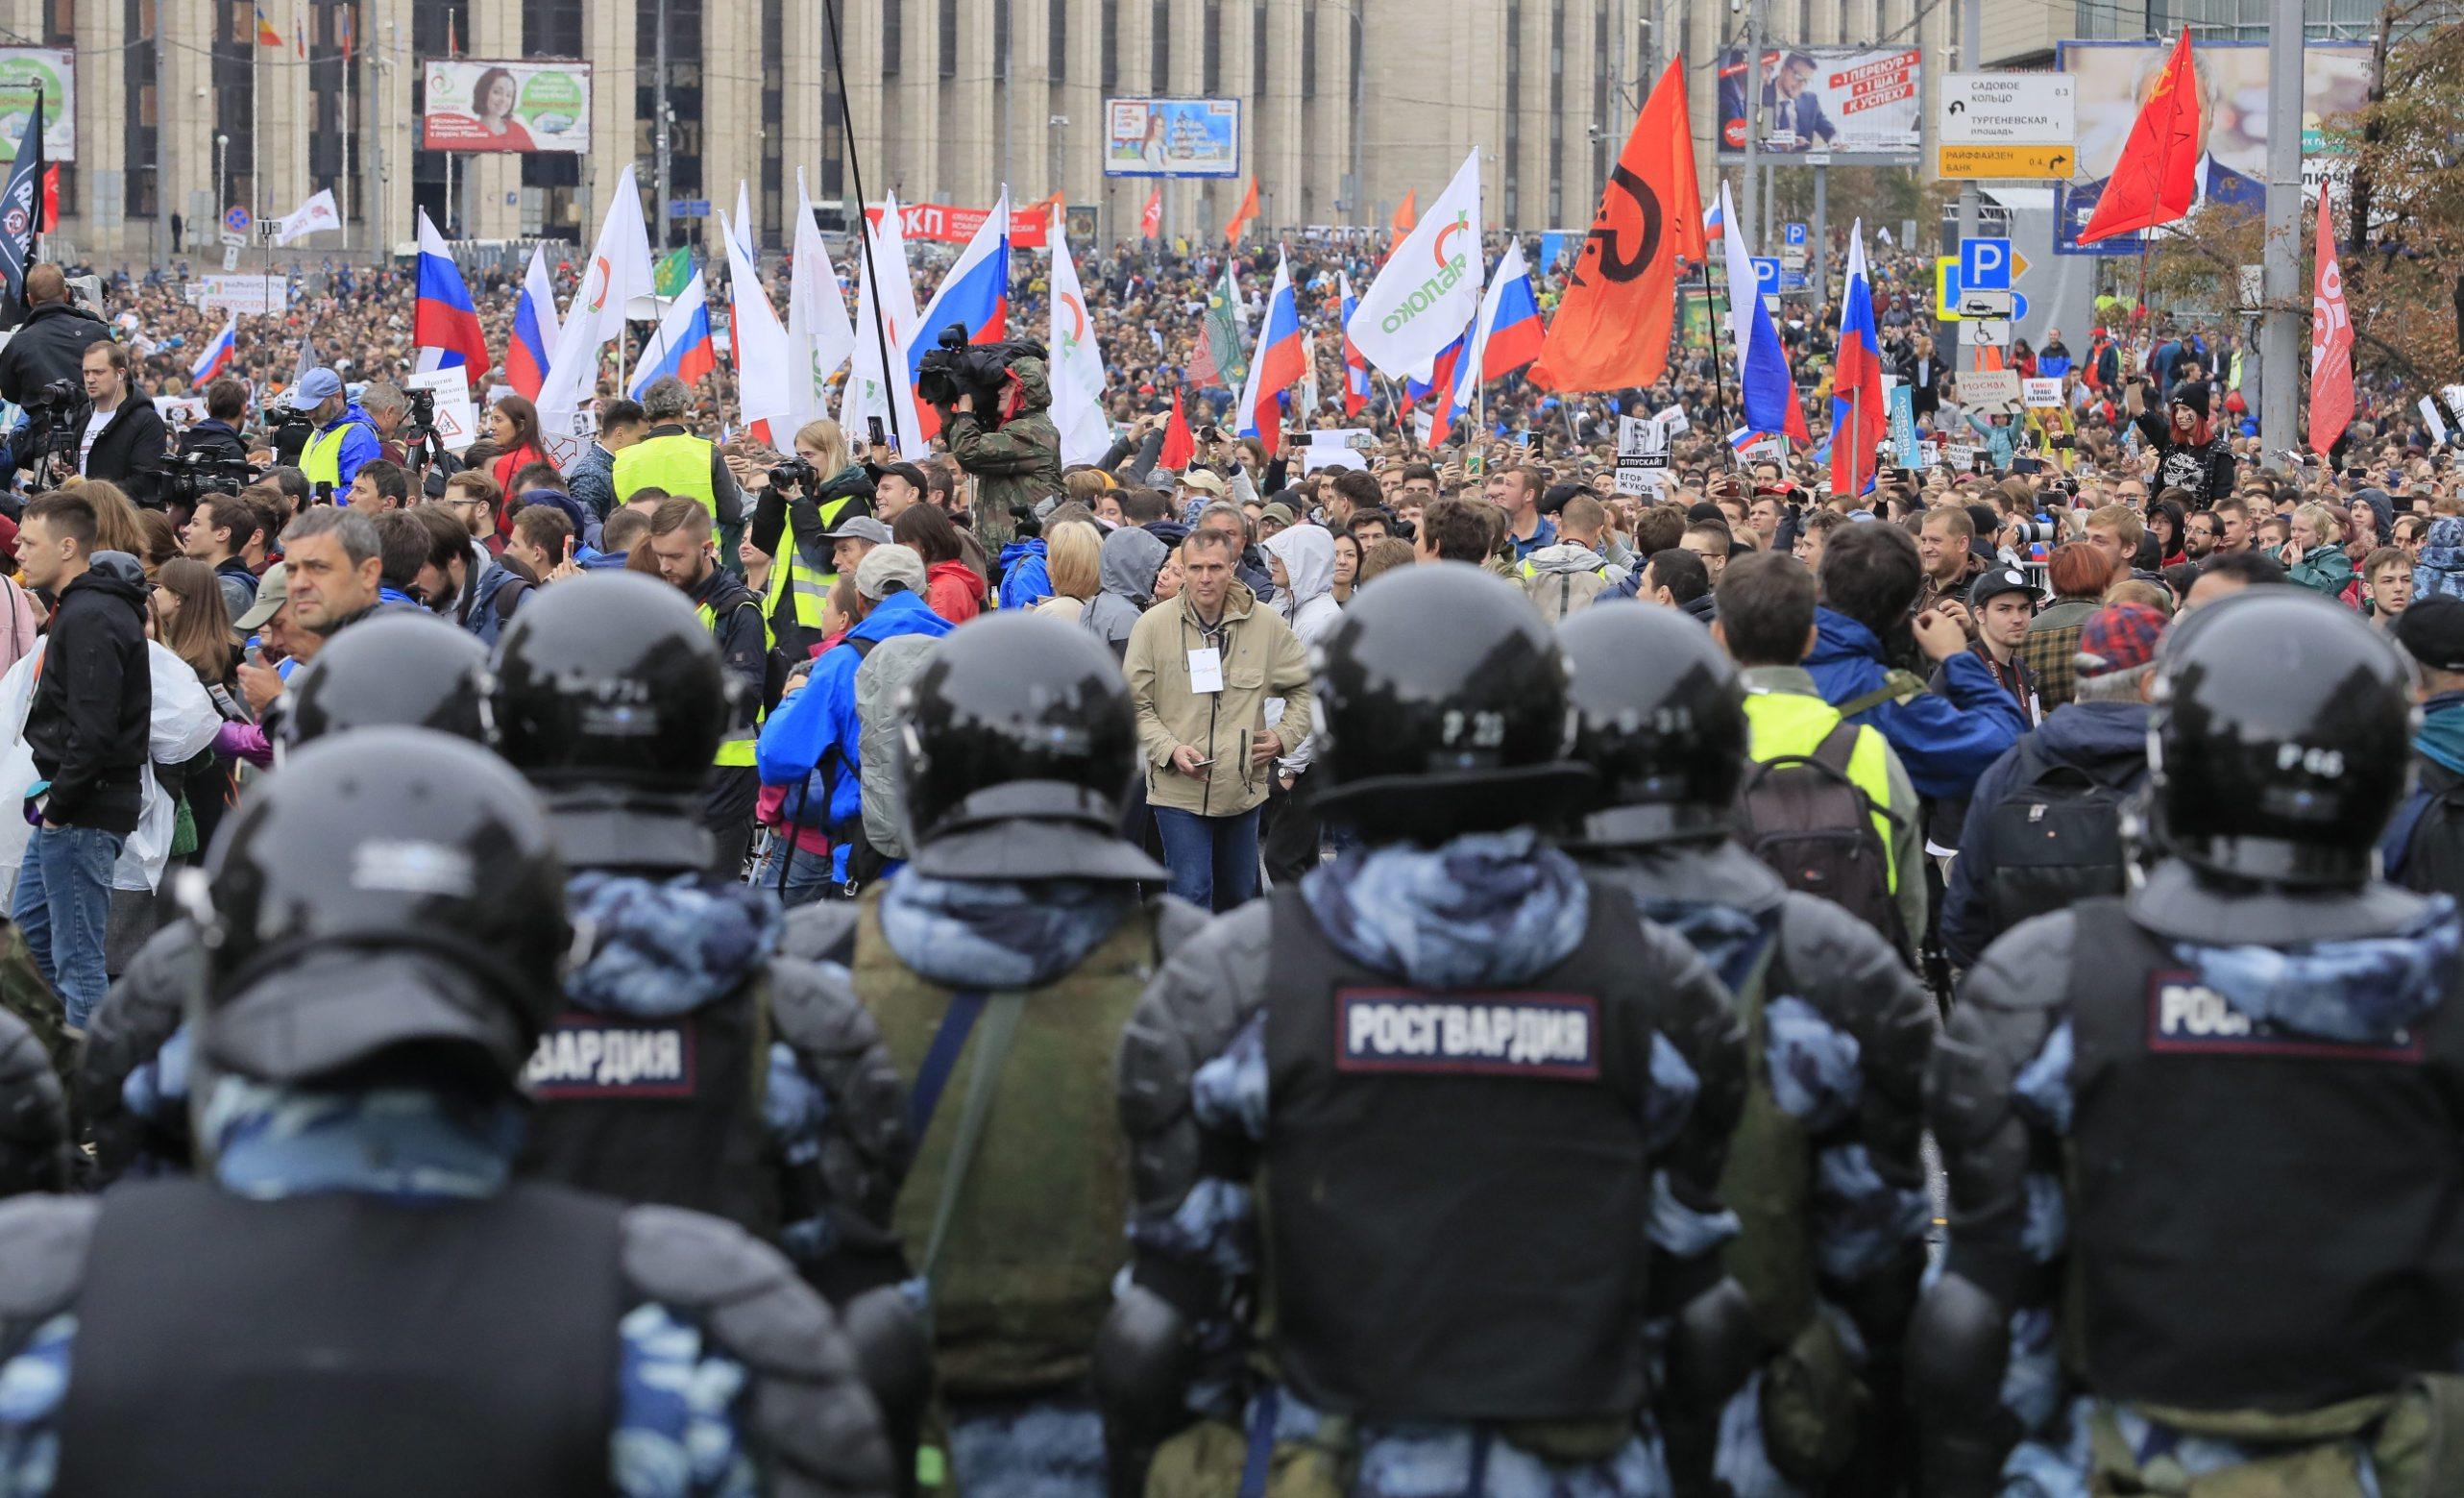 2019-08-10T134919Z_1232660420_UP1EF8A12E7J1_RTRMADP_3_RUSSIA-POLITICS-PROTESTS